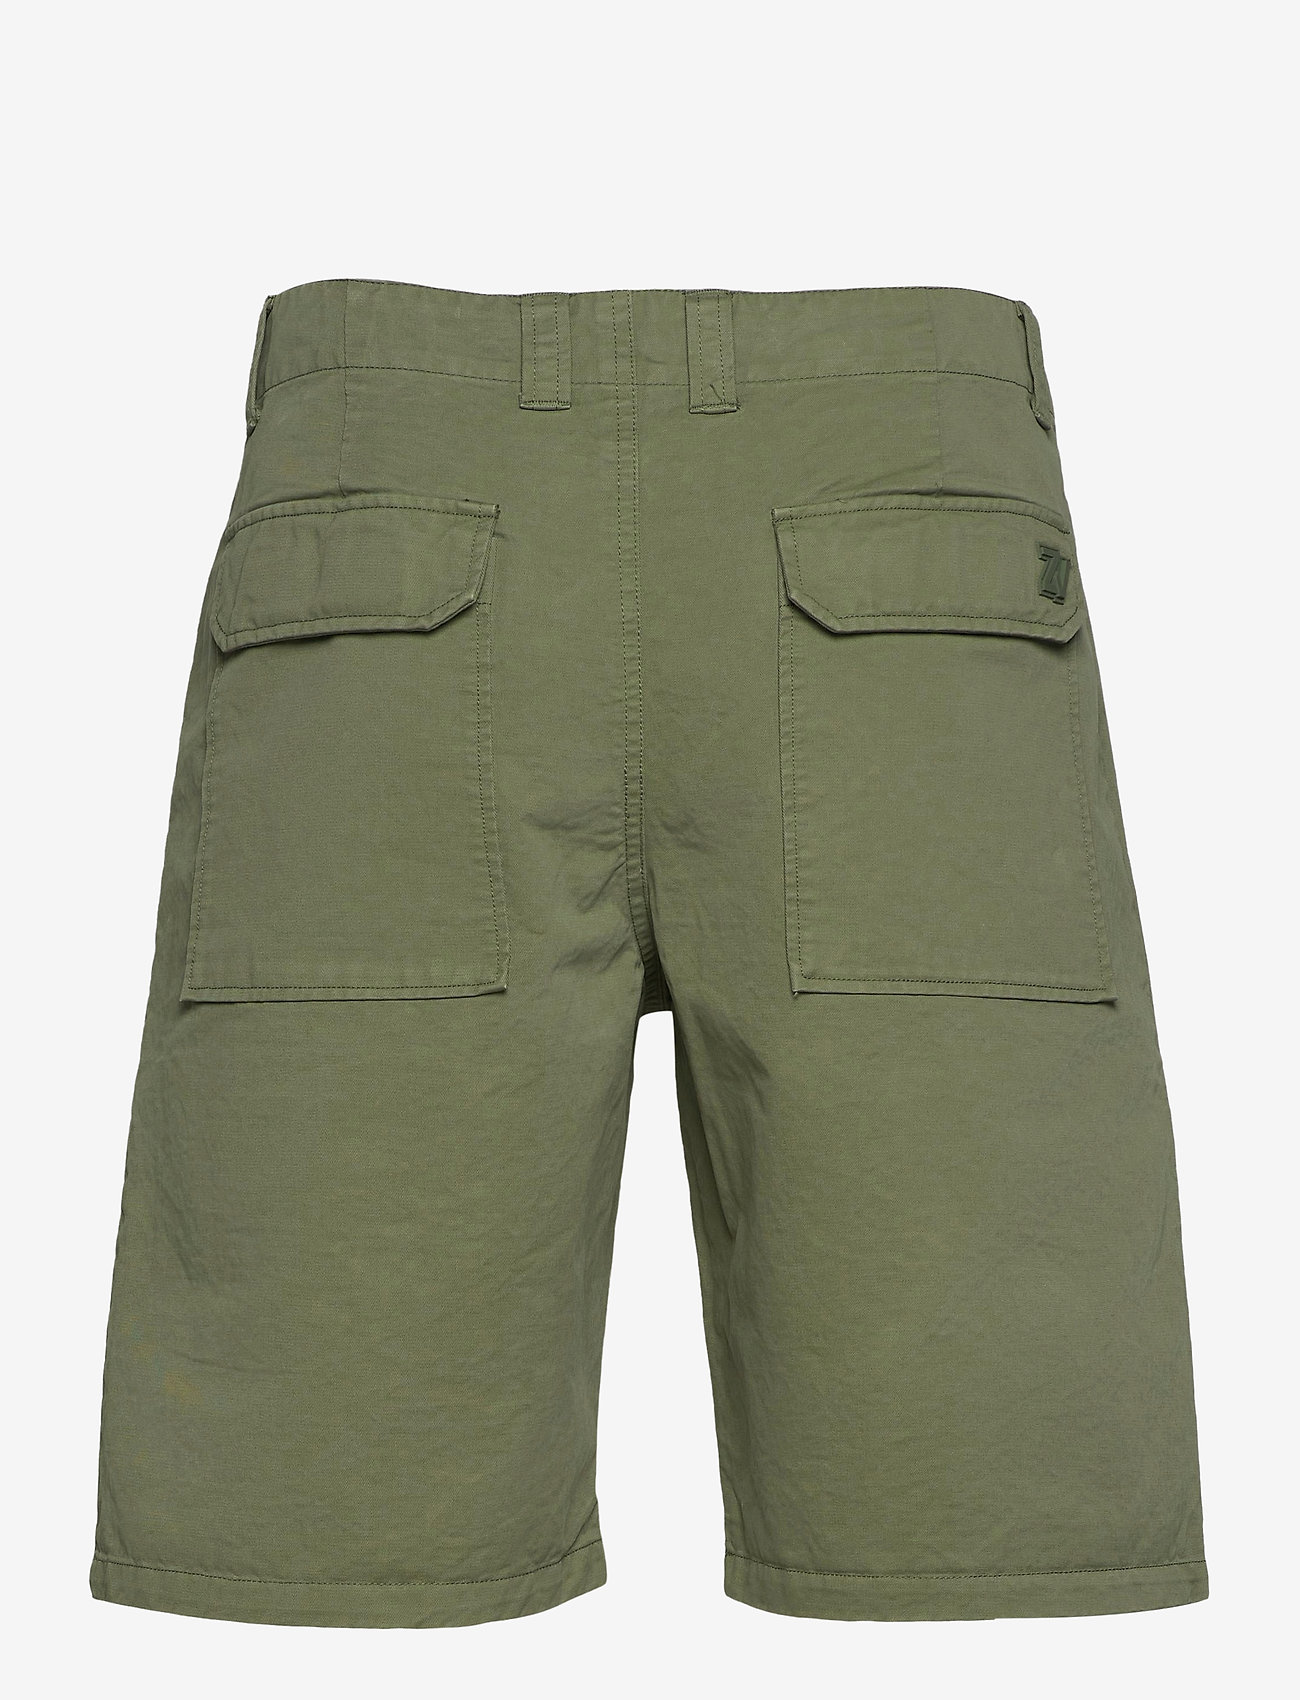 Zadig & Voltaire - PIERS MILI DYE SHORTS - cargo shorts - thym - 1